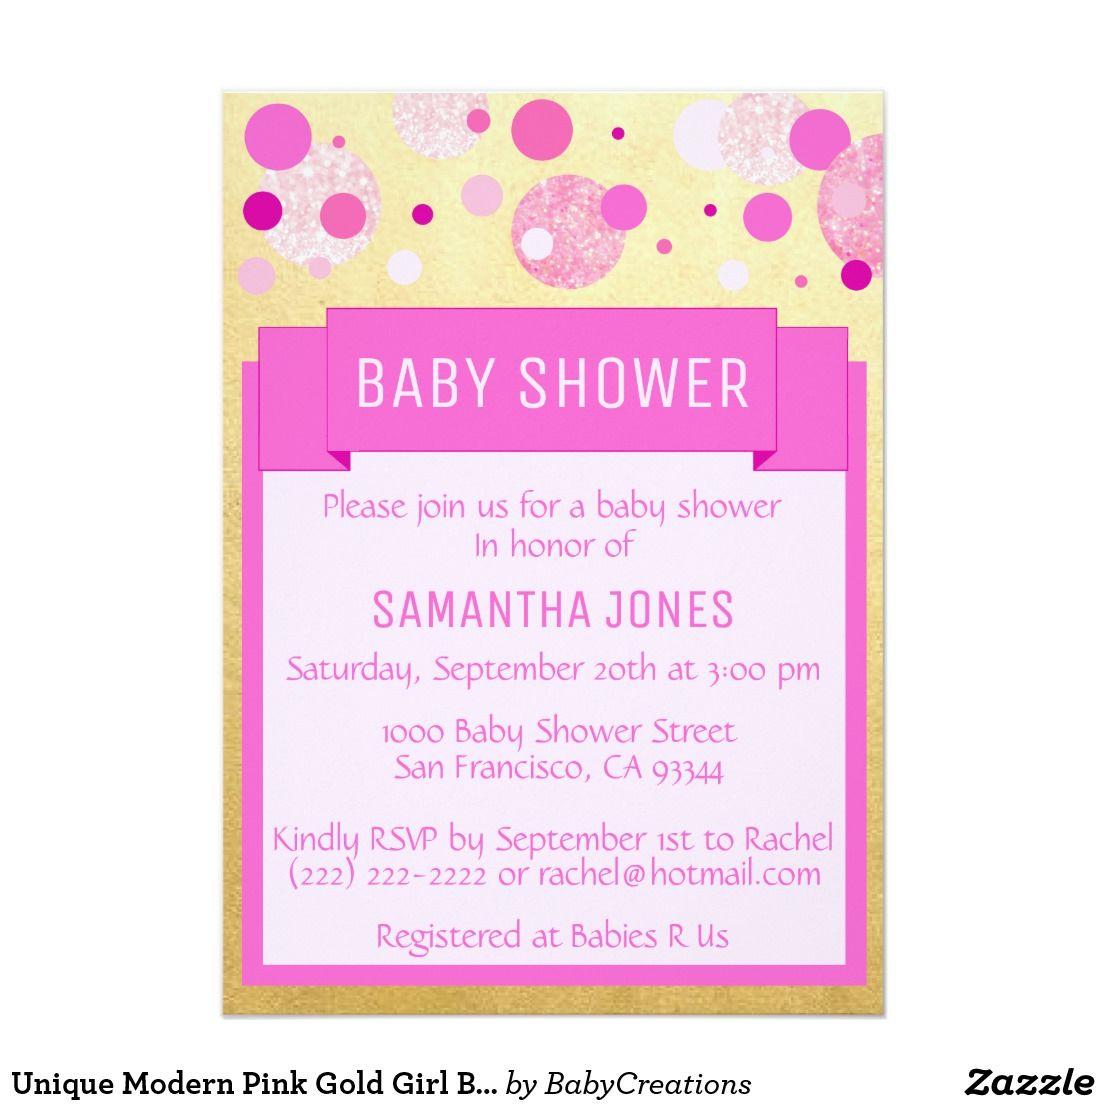 Unique Modern Pink Gold Girl Baby Shower Sprinkle Card Impress your ...